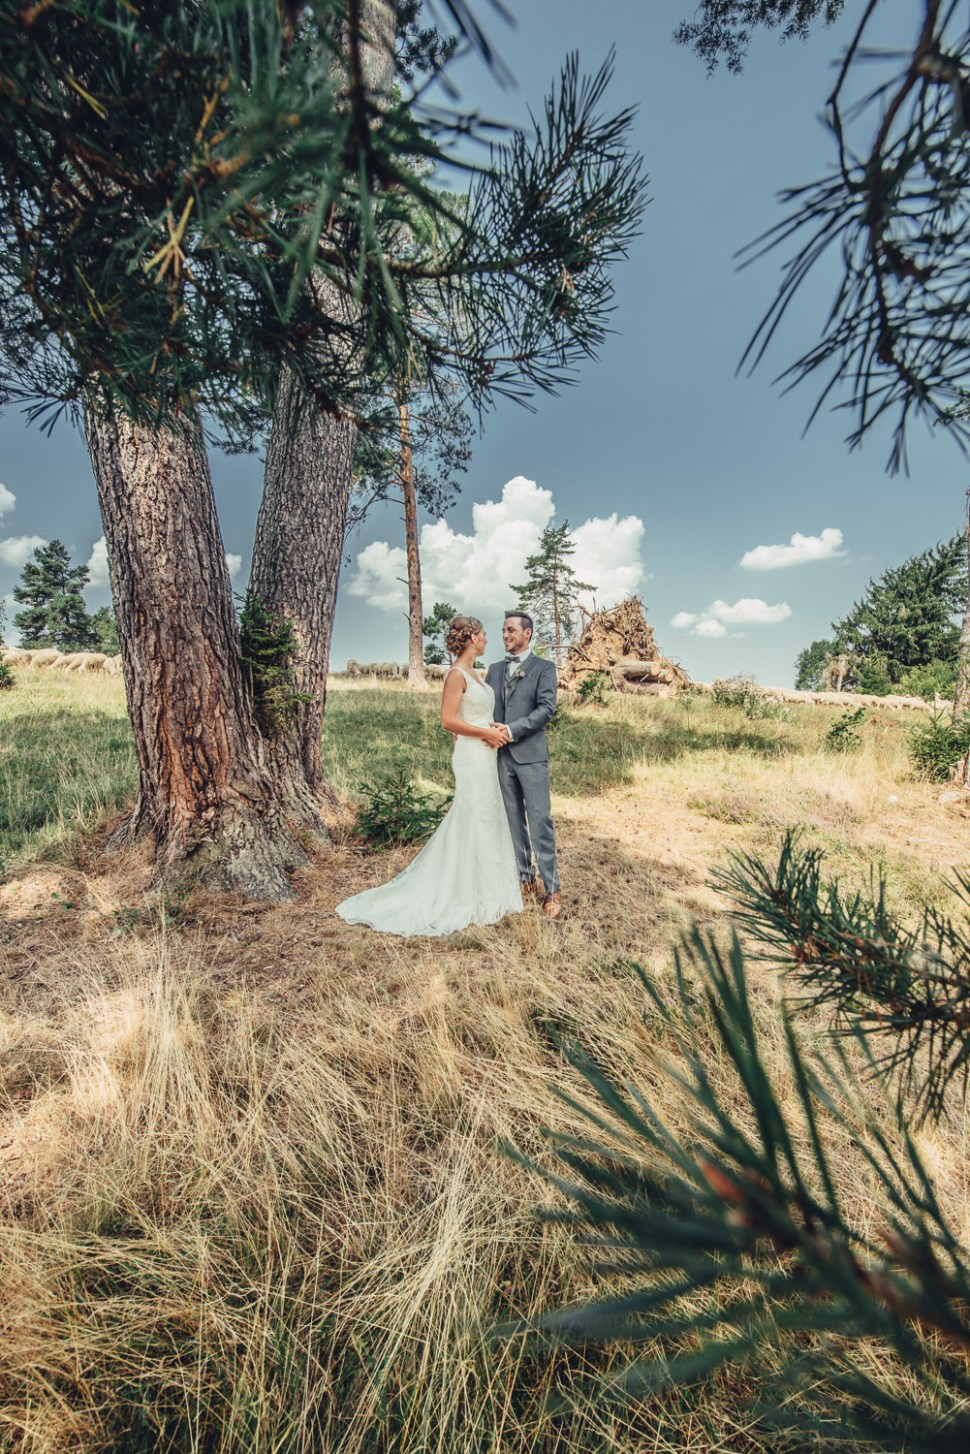 weddingaugust2018luminoxx723445-66